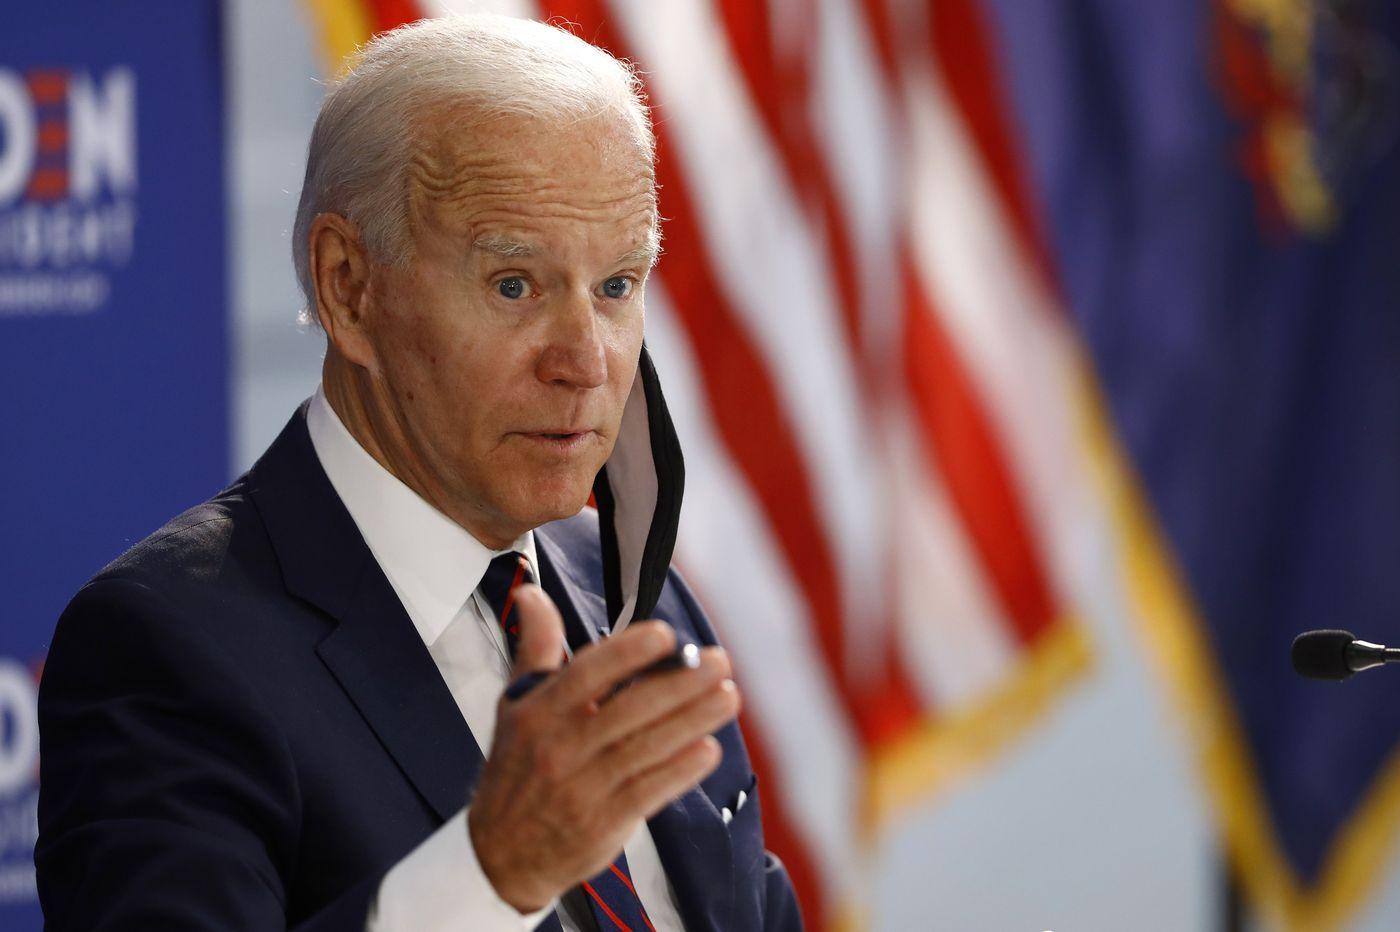 US Election 2020: Biden is crowned as Democratic nominee